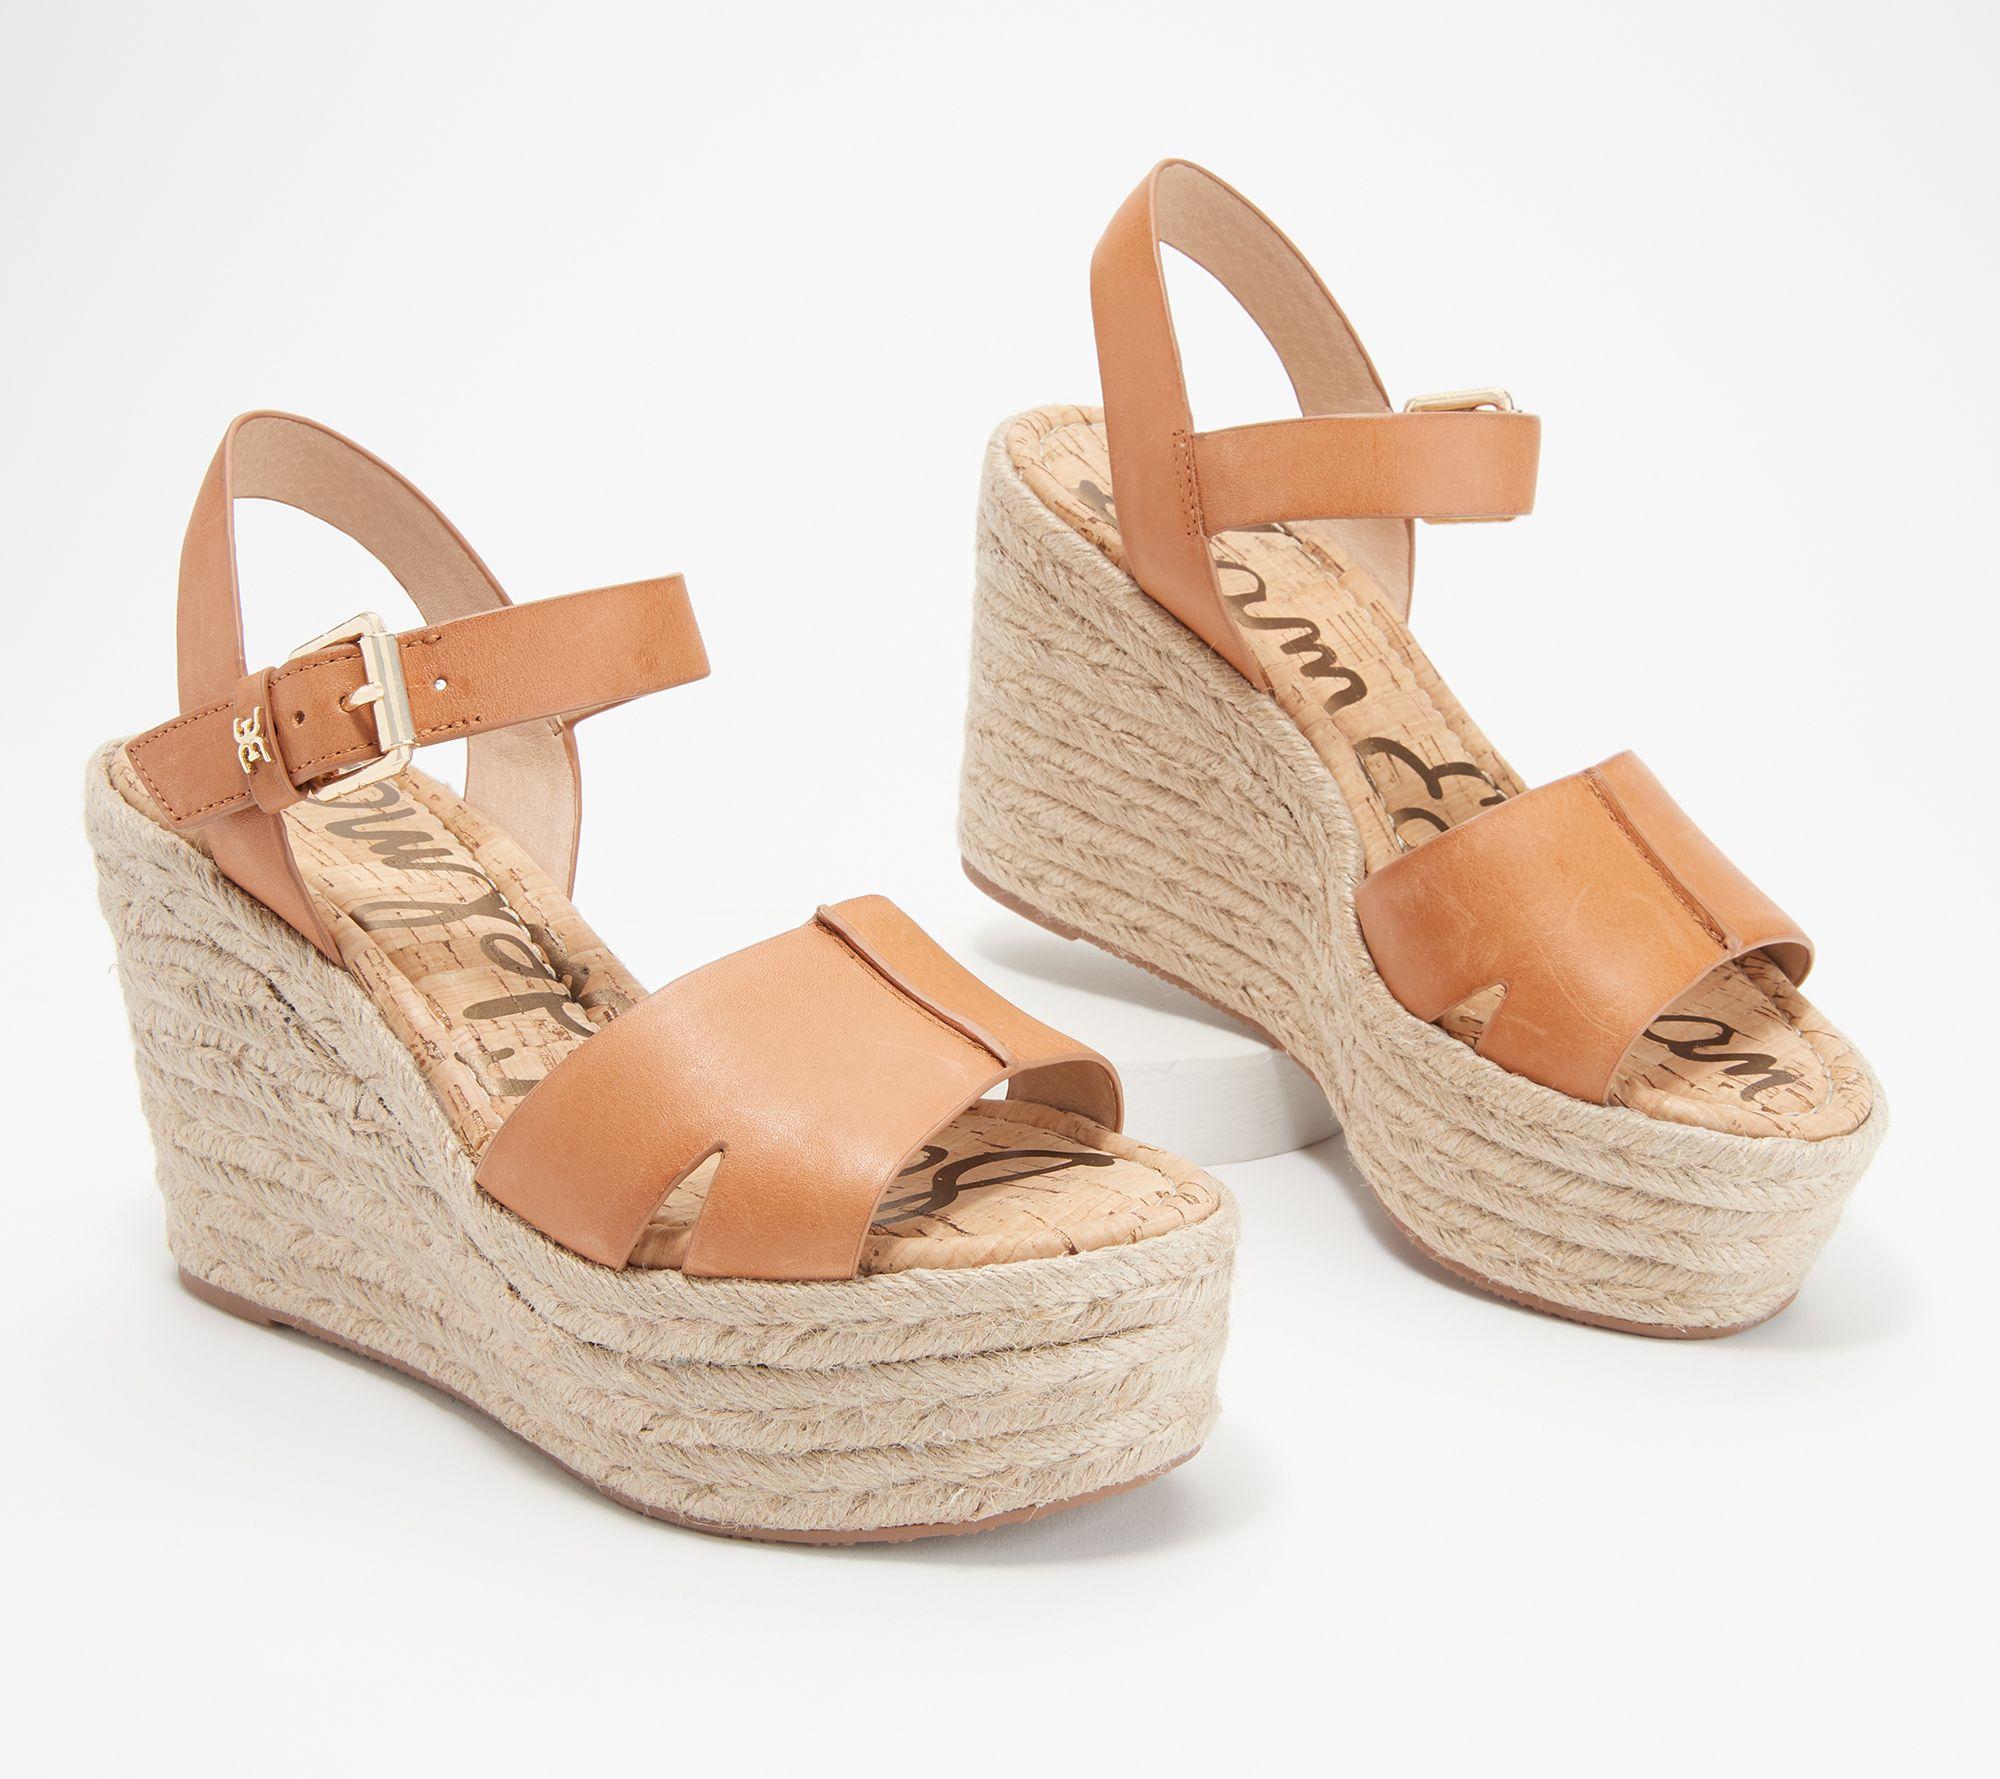 54ce5e6ca8c Sam Edelman Leather Wedge Sandals - Maura — QVC.com